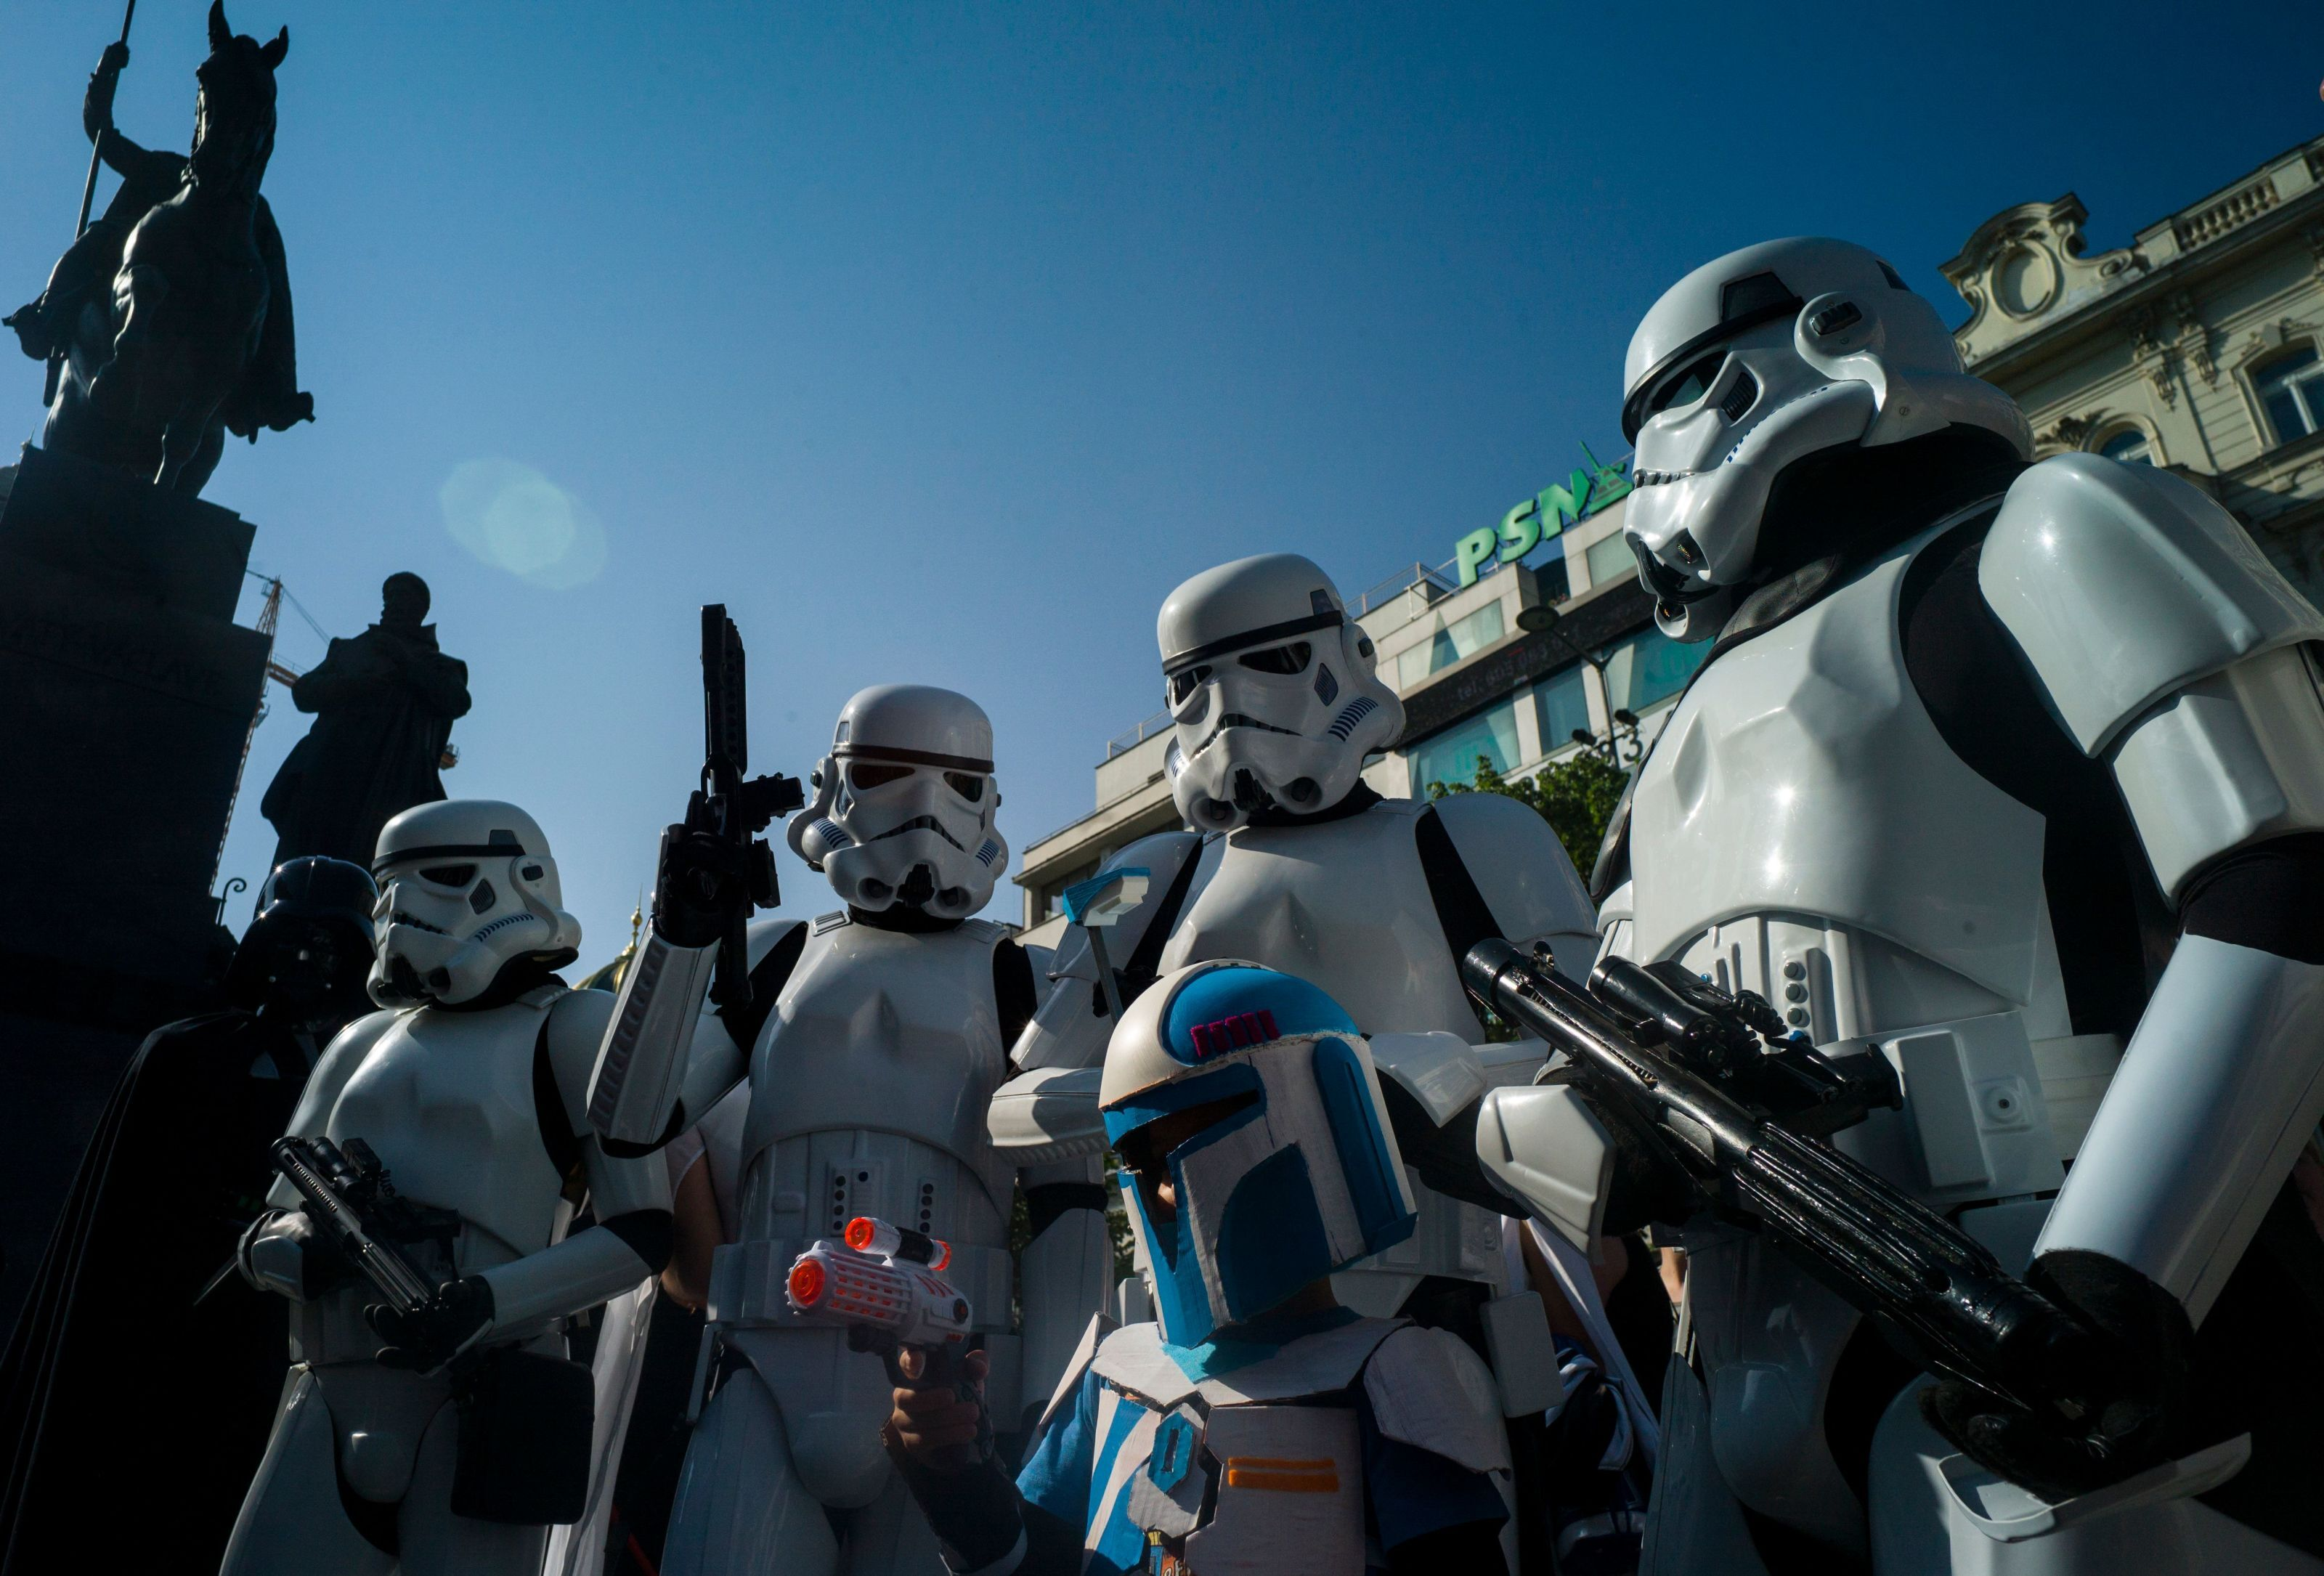 Star Wars Episode 9 trailer release date and time: Celebration panel details